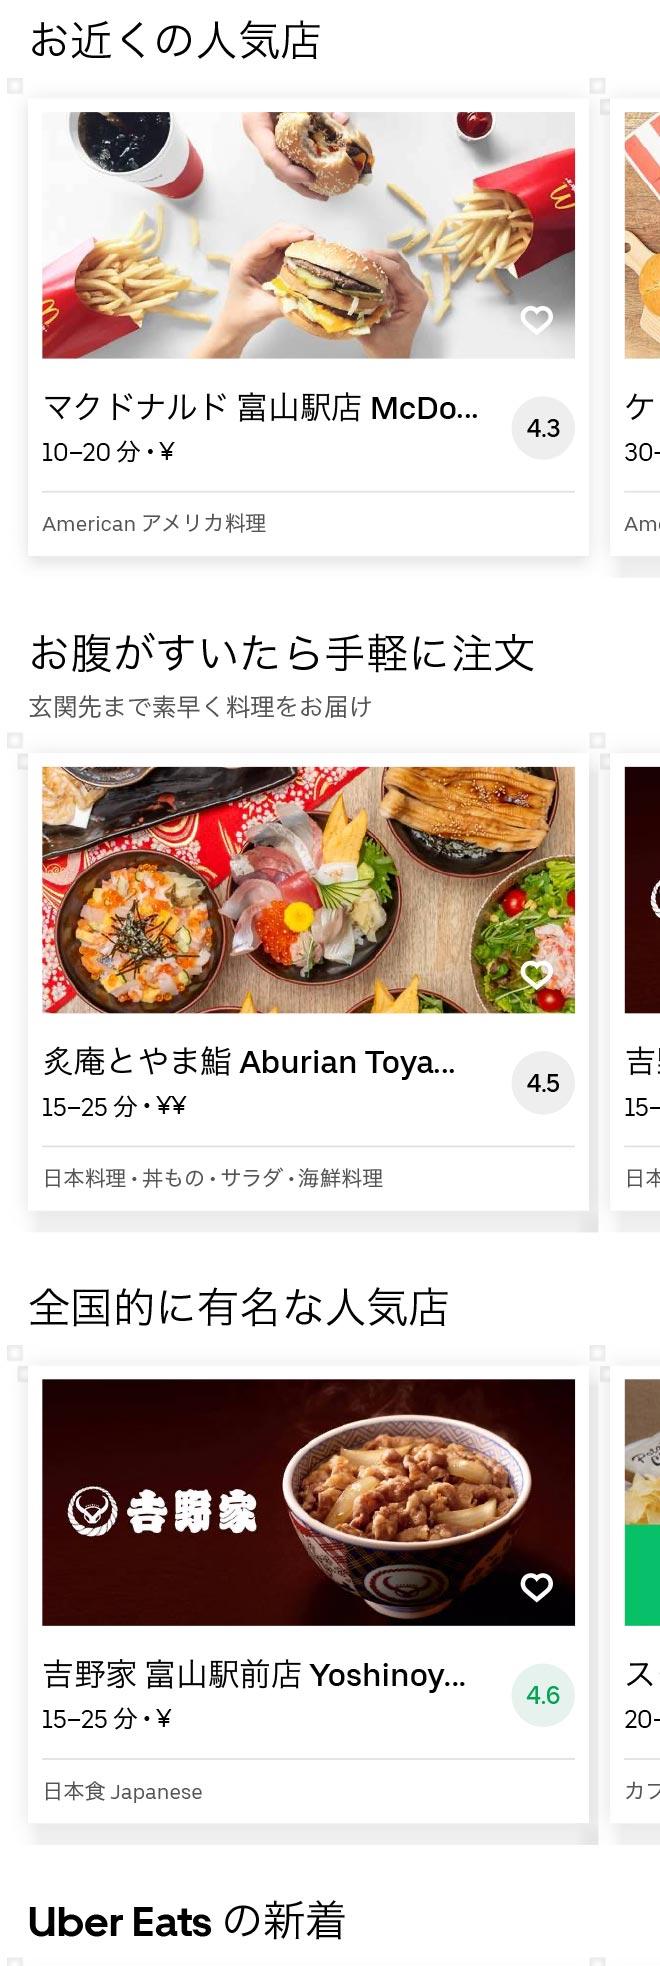 Toyama menu 2009 01